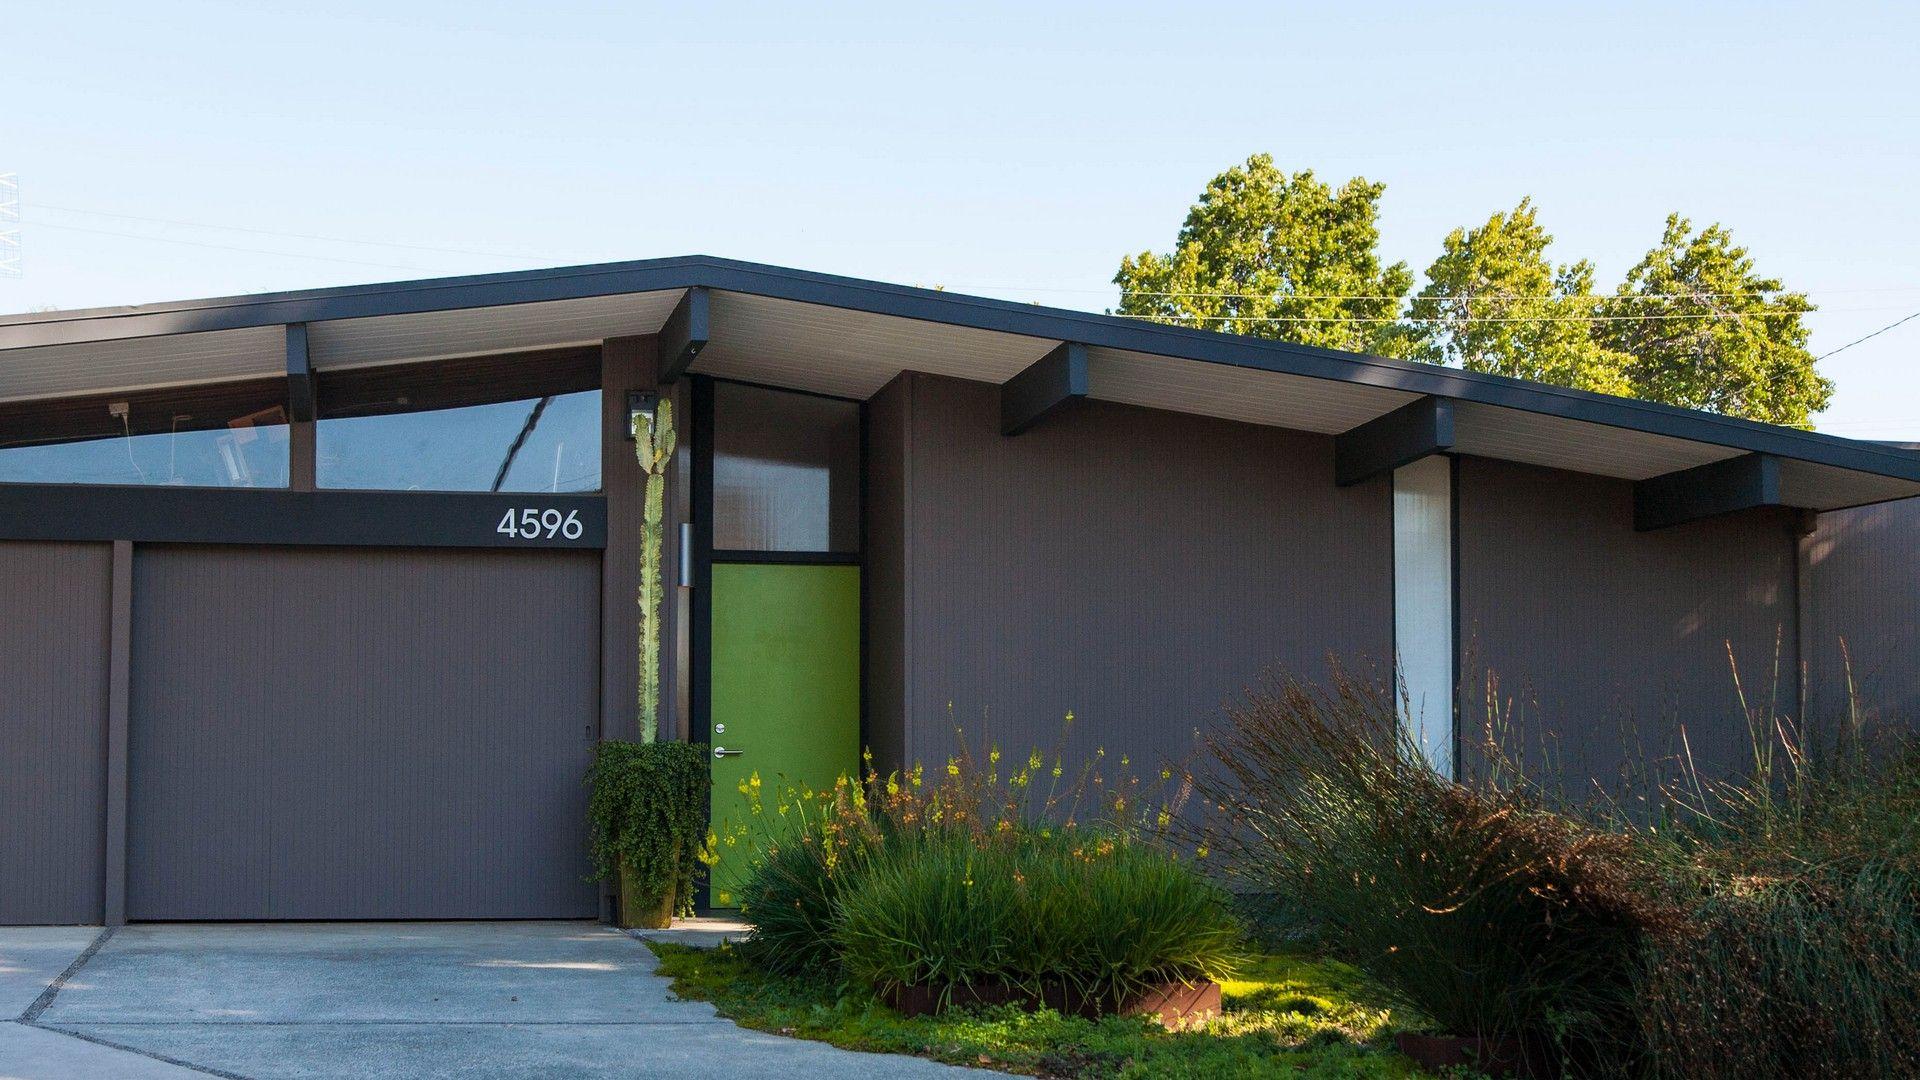 San Jose Eichler Homes South Bay Eichlers Mid Century Modern